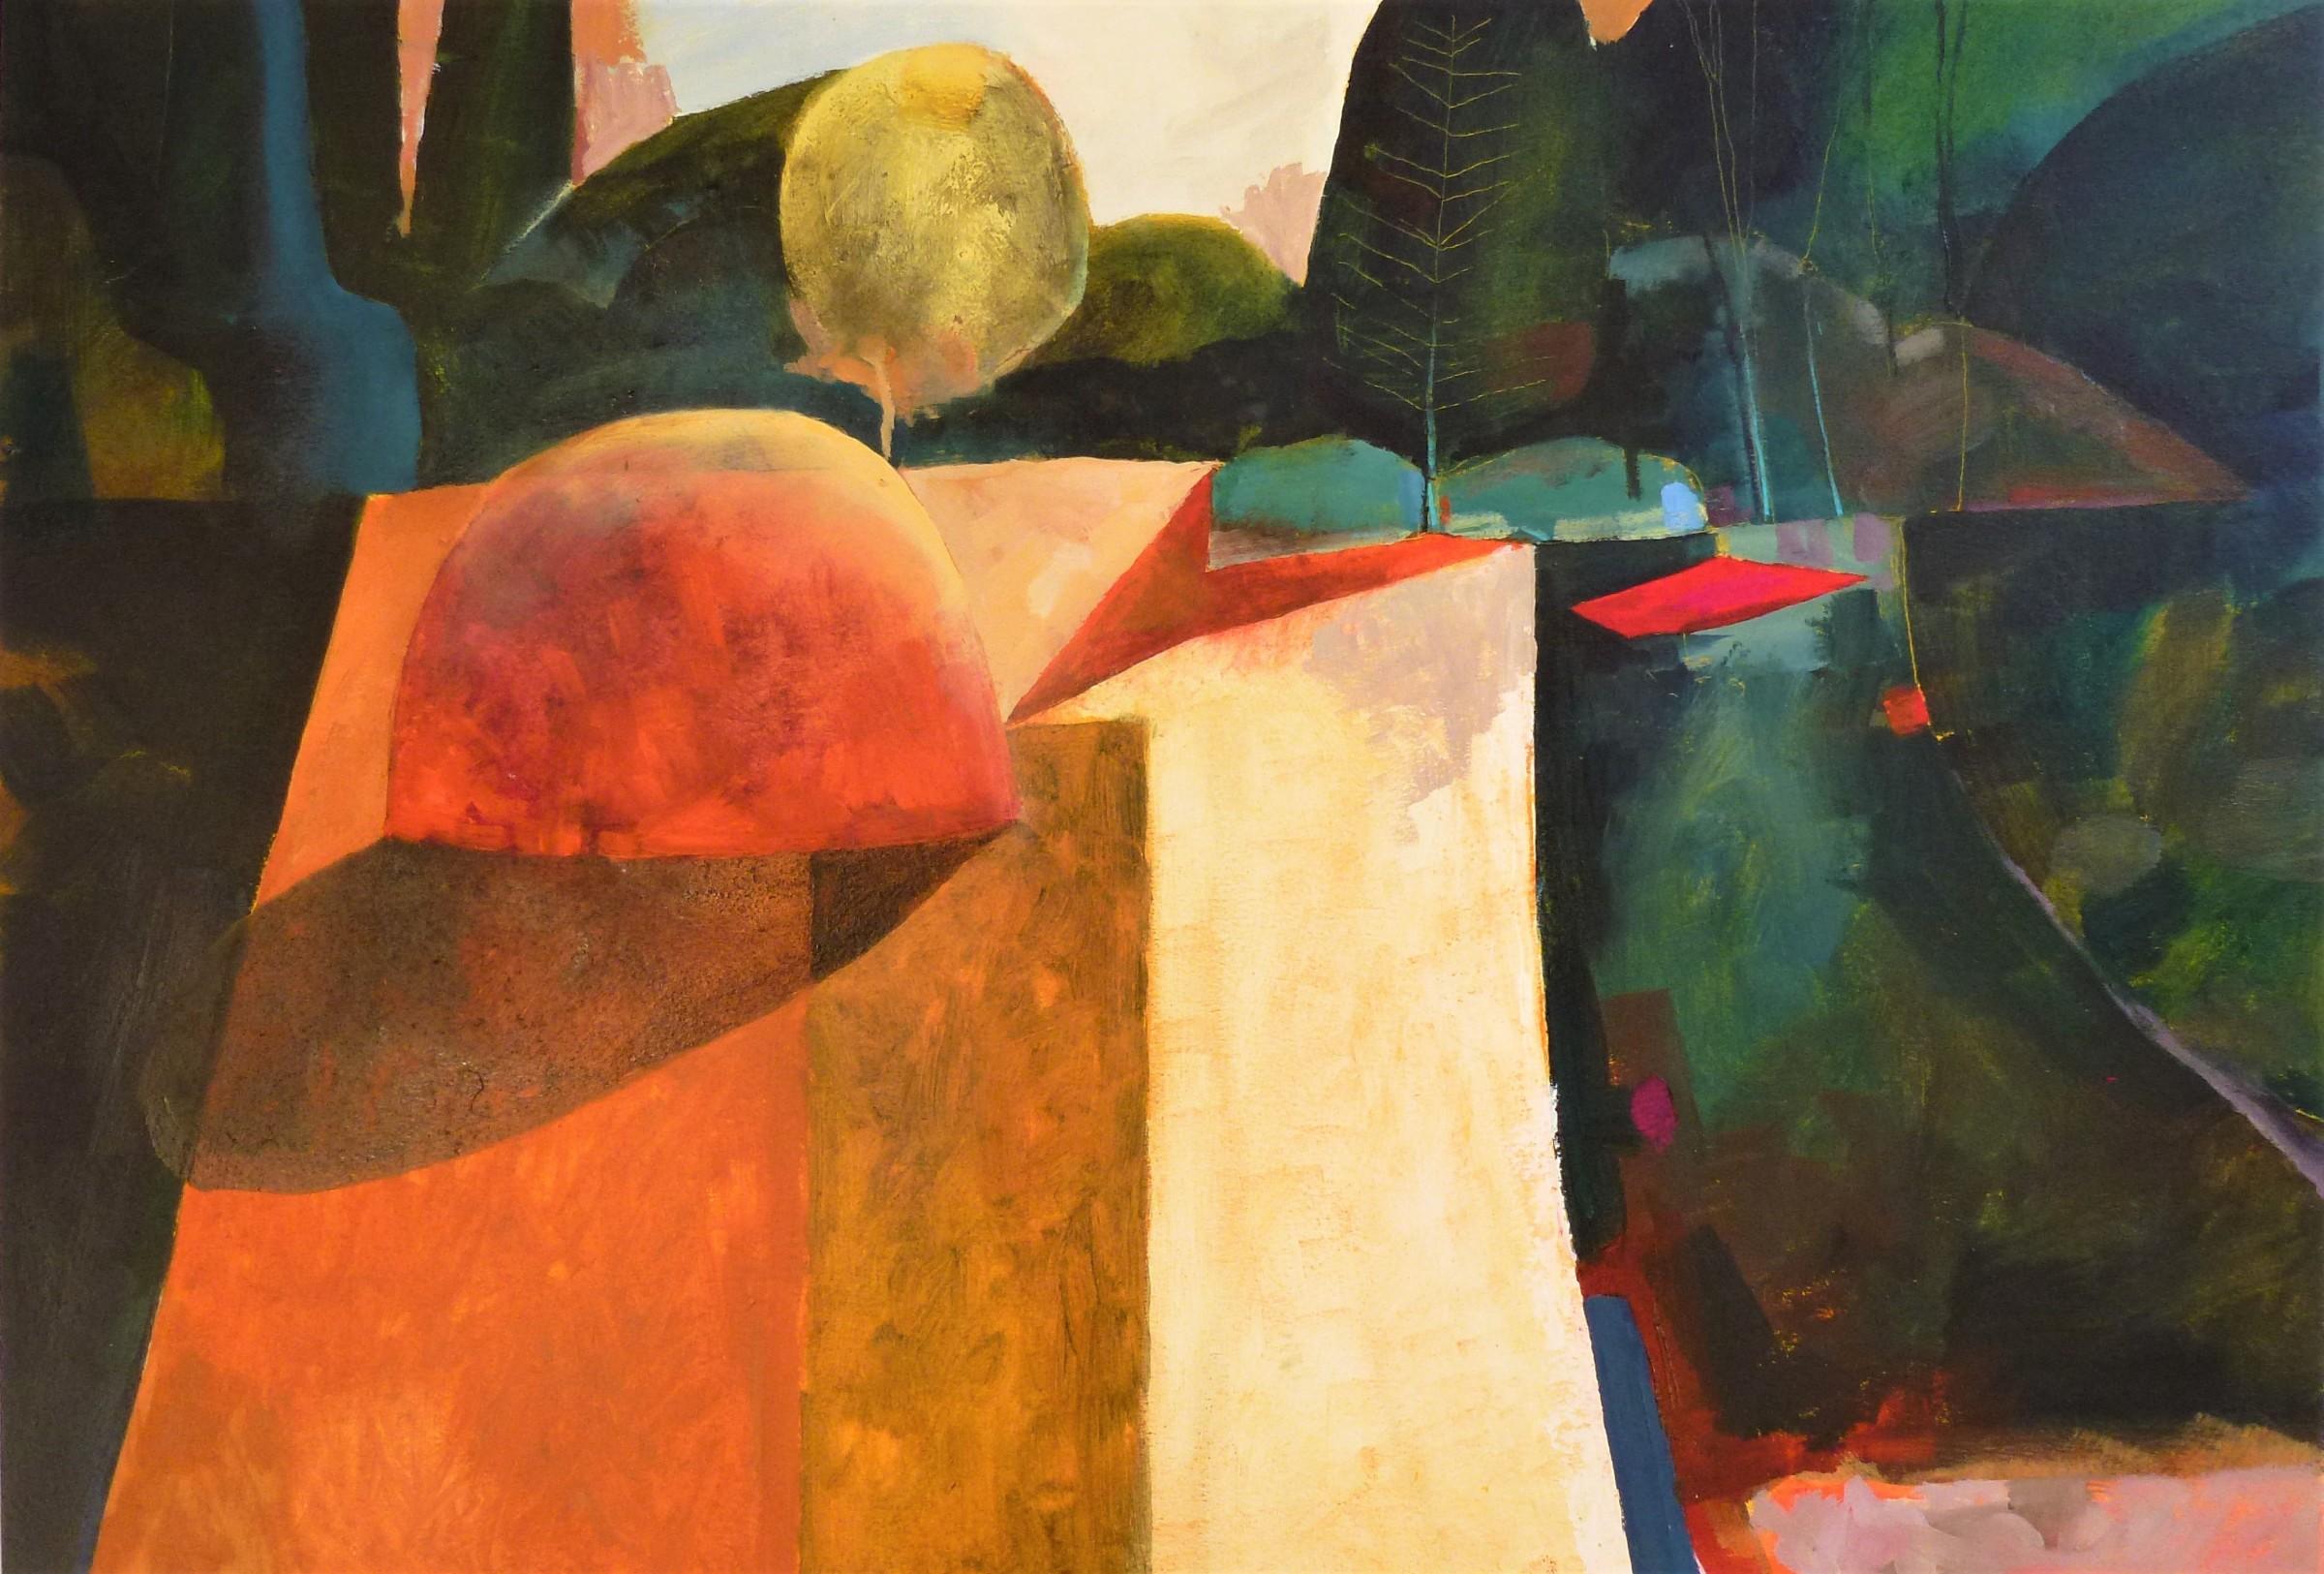 "<span class=""link fancybox-details-link""><a href=""/artists/315-claire-denny/works/12505-claire-denny-evening-garden/"">View Detail Page</a></span><div class=""artist""><span class=""artist""><strong>Claire Denny</strong></span></div><div class=""title""><em>Evening Garden</em></div><div class=""medium"">oil on sized paper</div><div class=""dimensions"">Artwork: 59 x 40cm</div><div class=""price"">£520.00</div>"